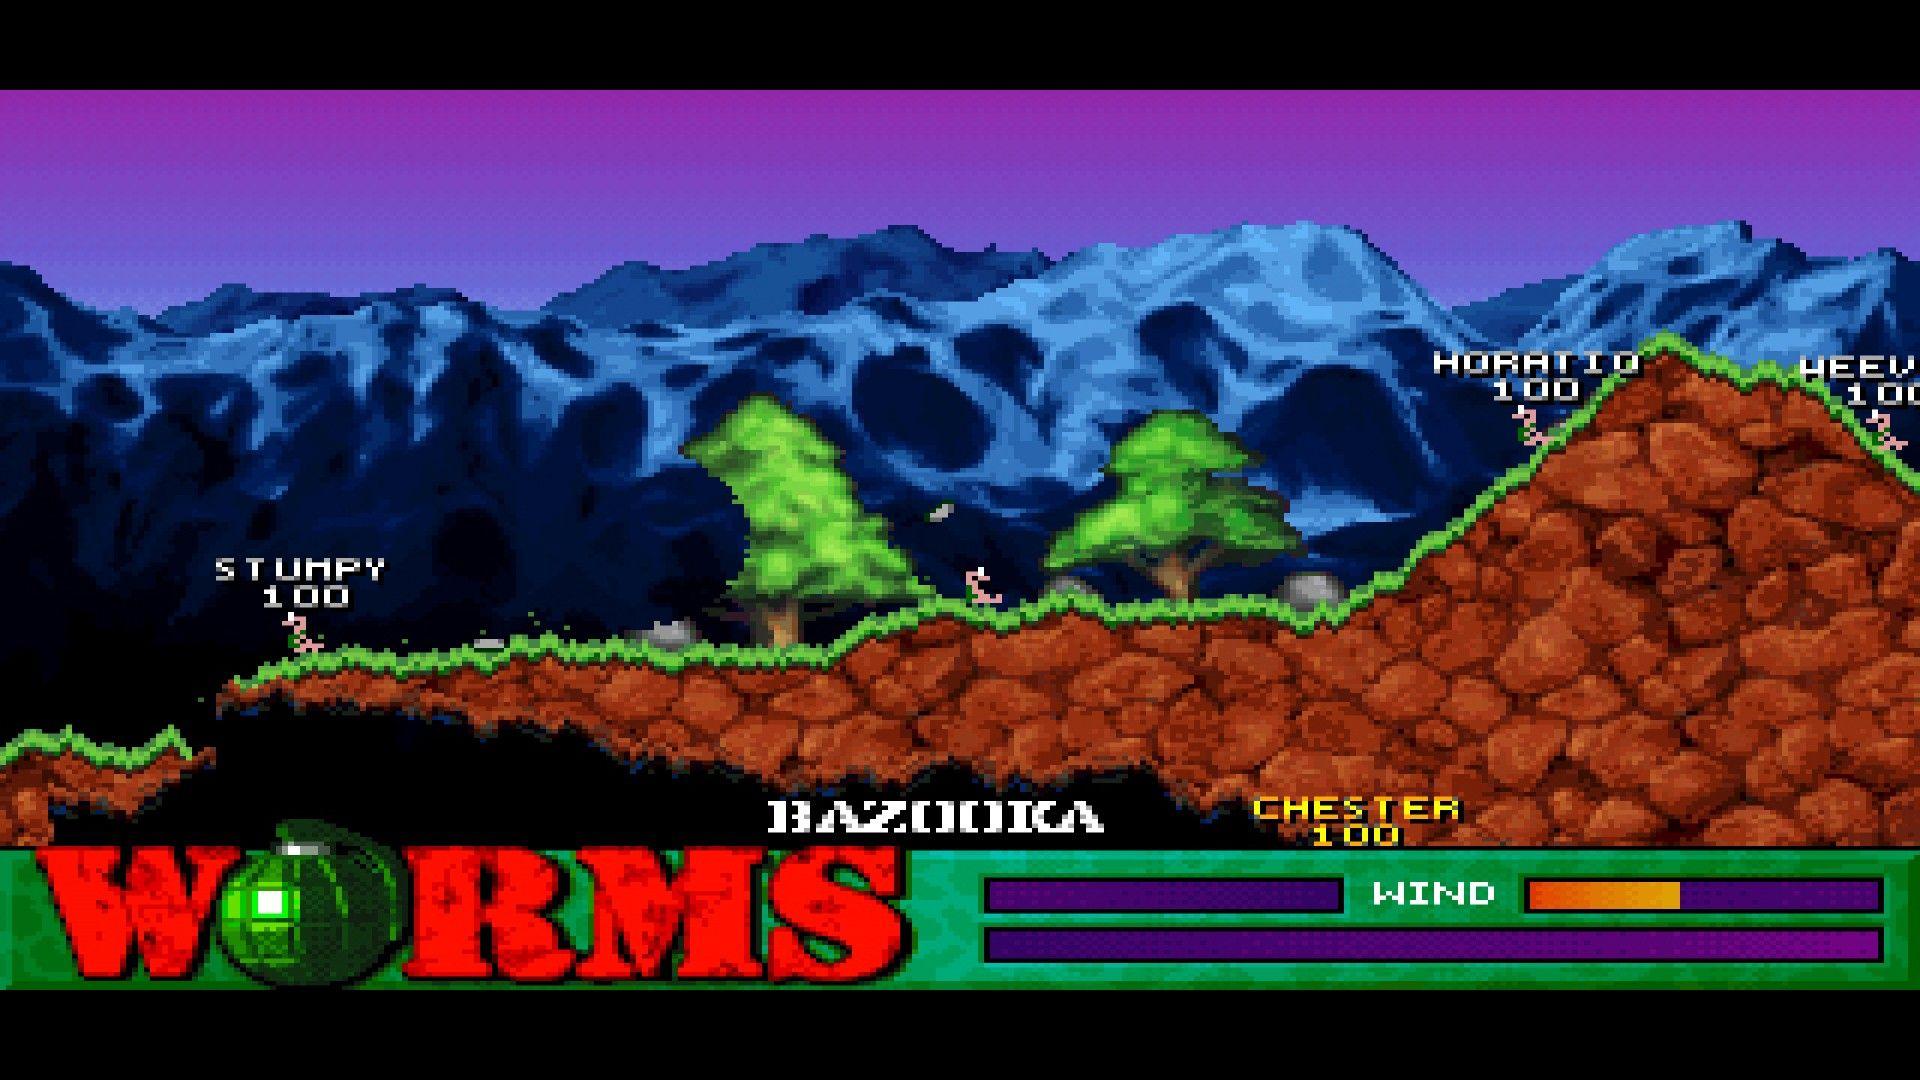 Worms Computerspiel